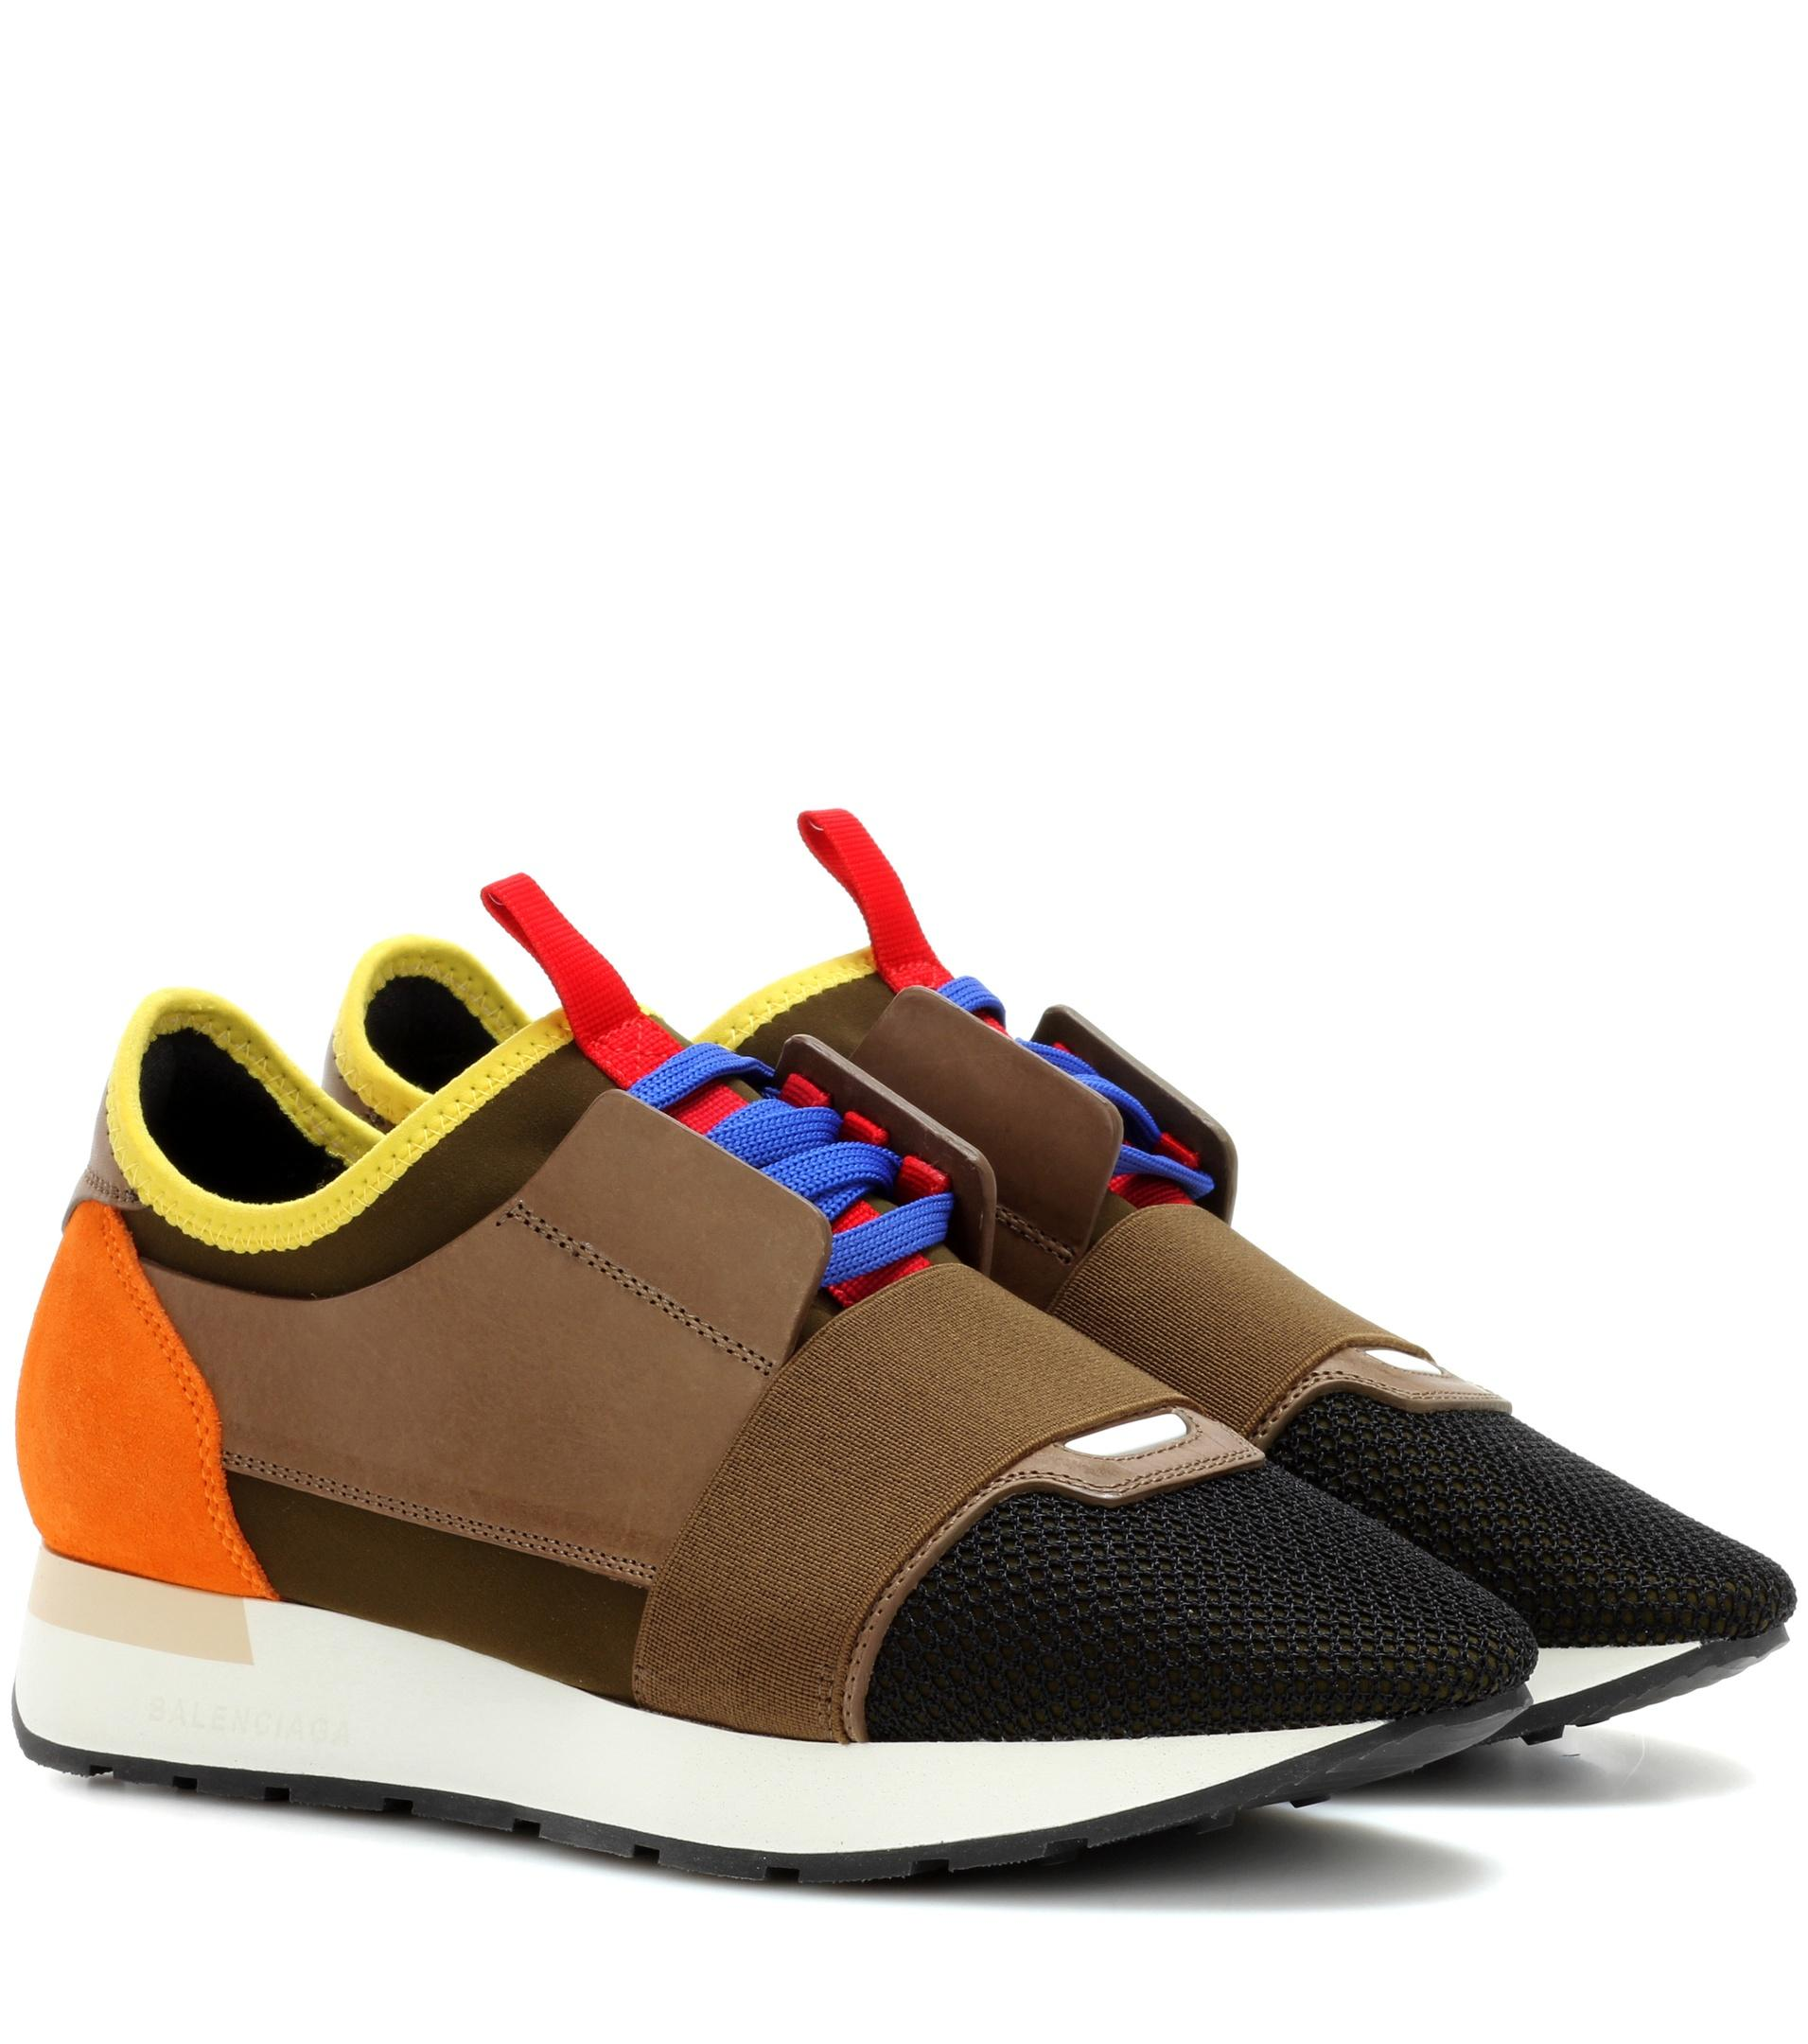 54decb45bdf0 Lyst - Balenciaga Race Runner Sneakers in Green